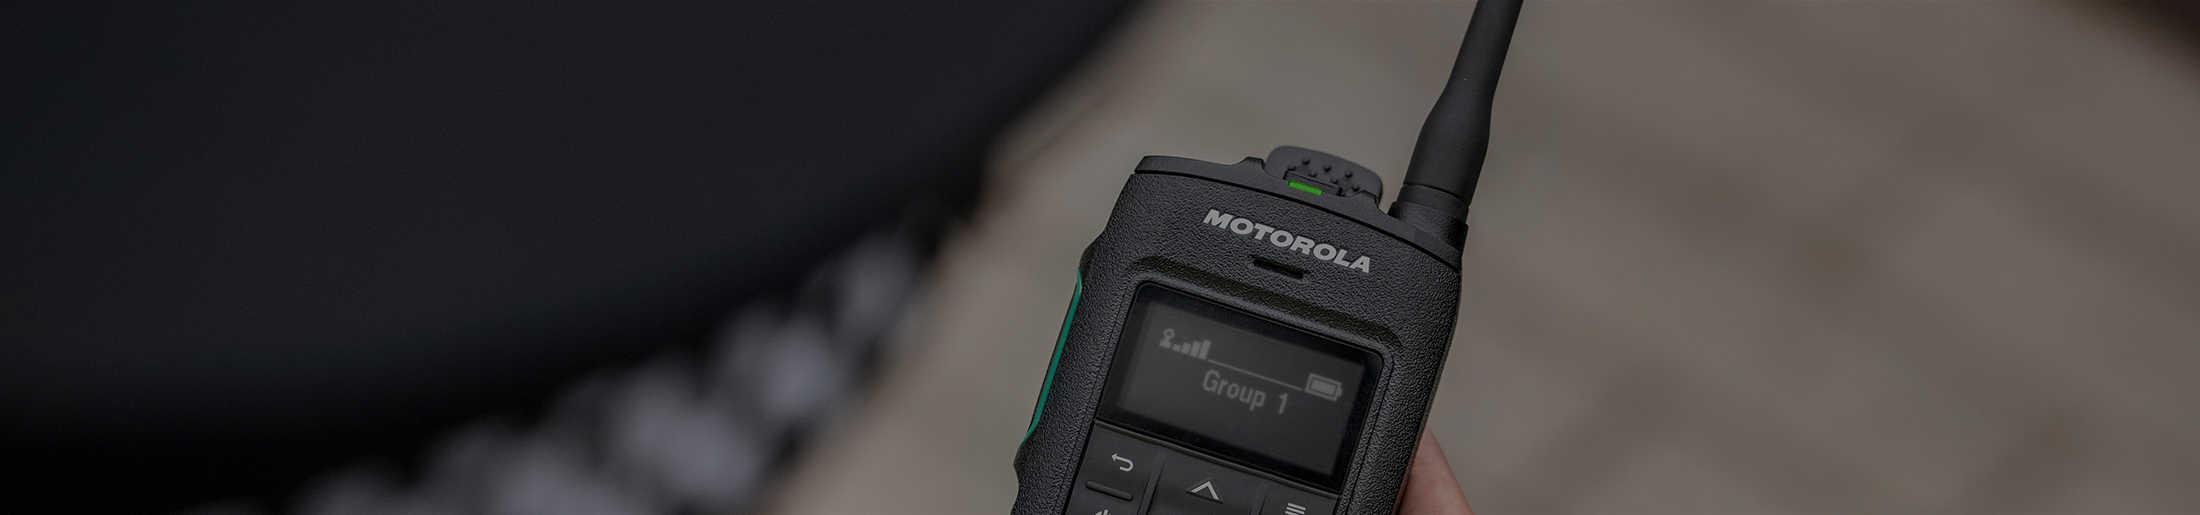 Motorola TETRA ST750 Pager Case Study image